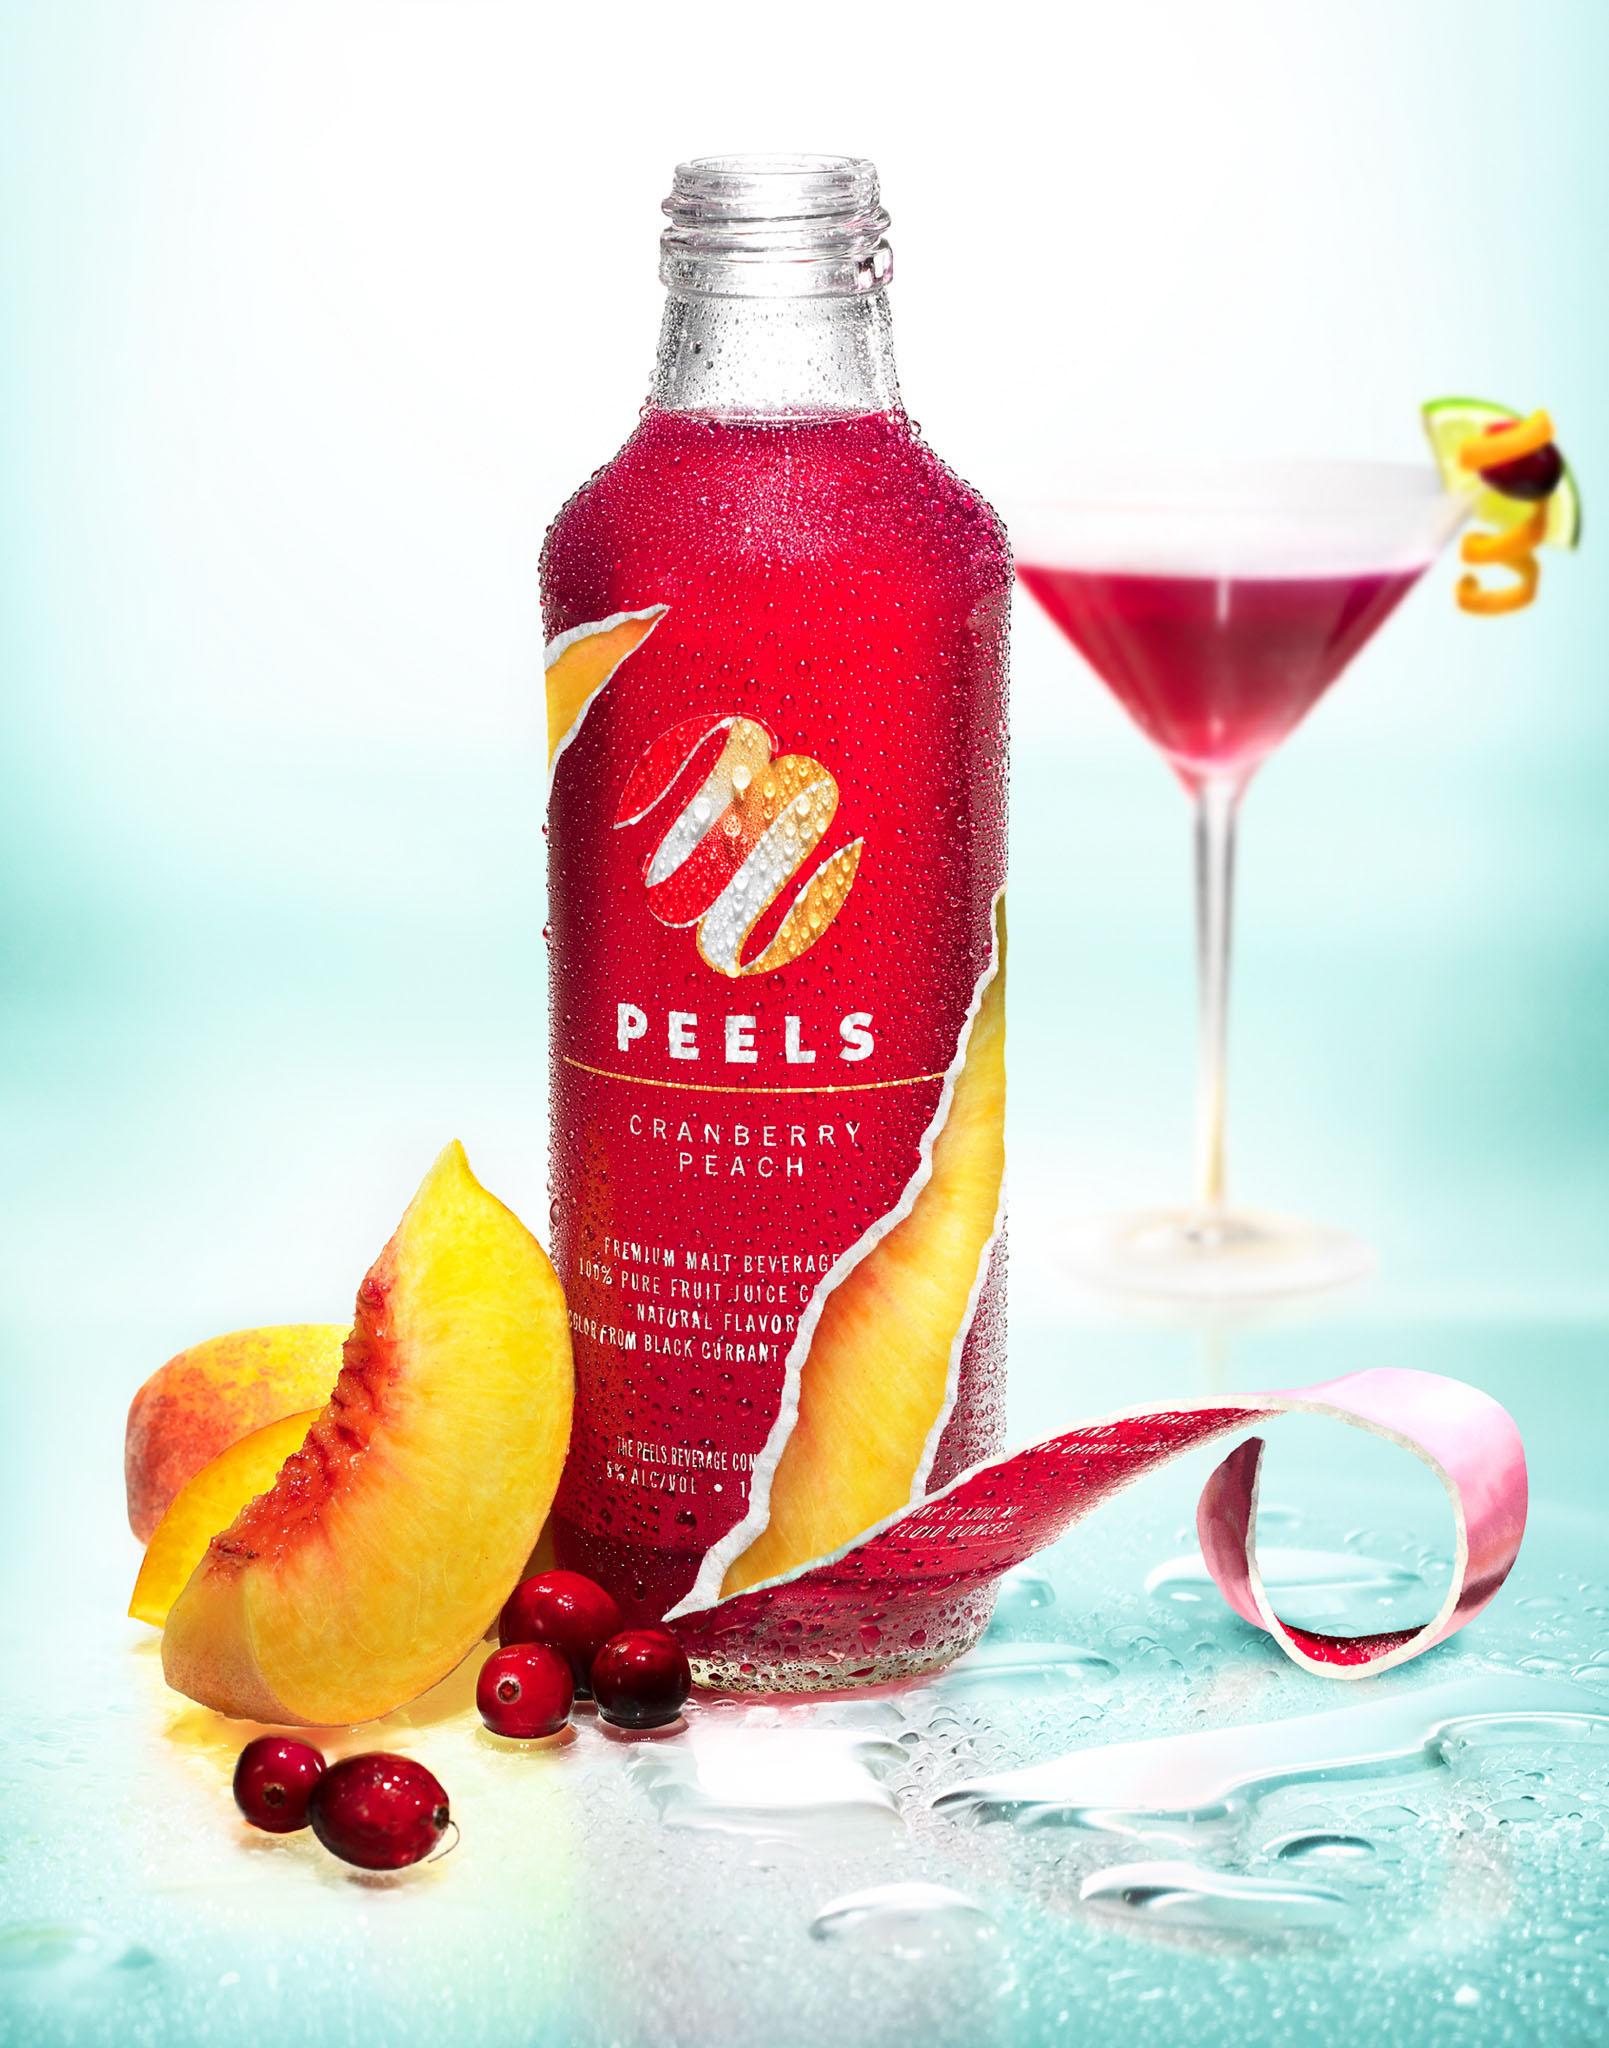 Peels_Cranberry_Peach1